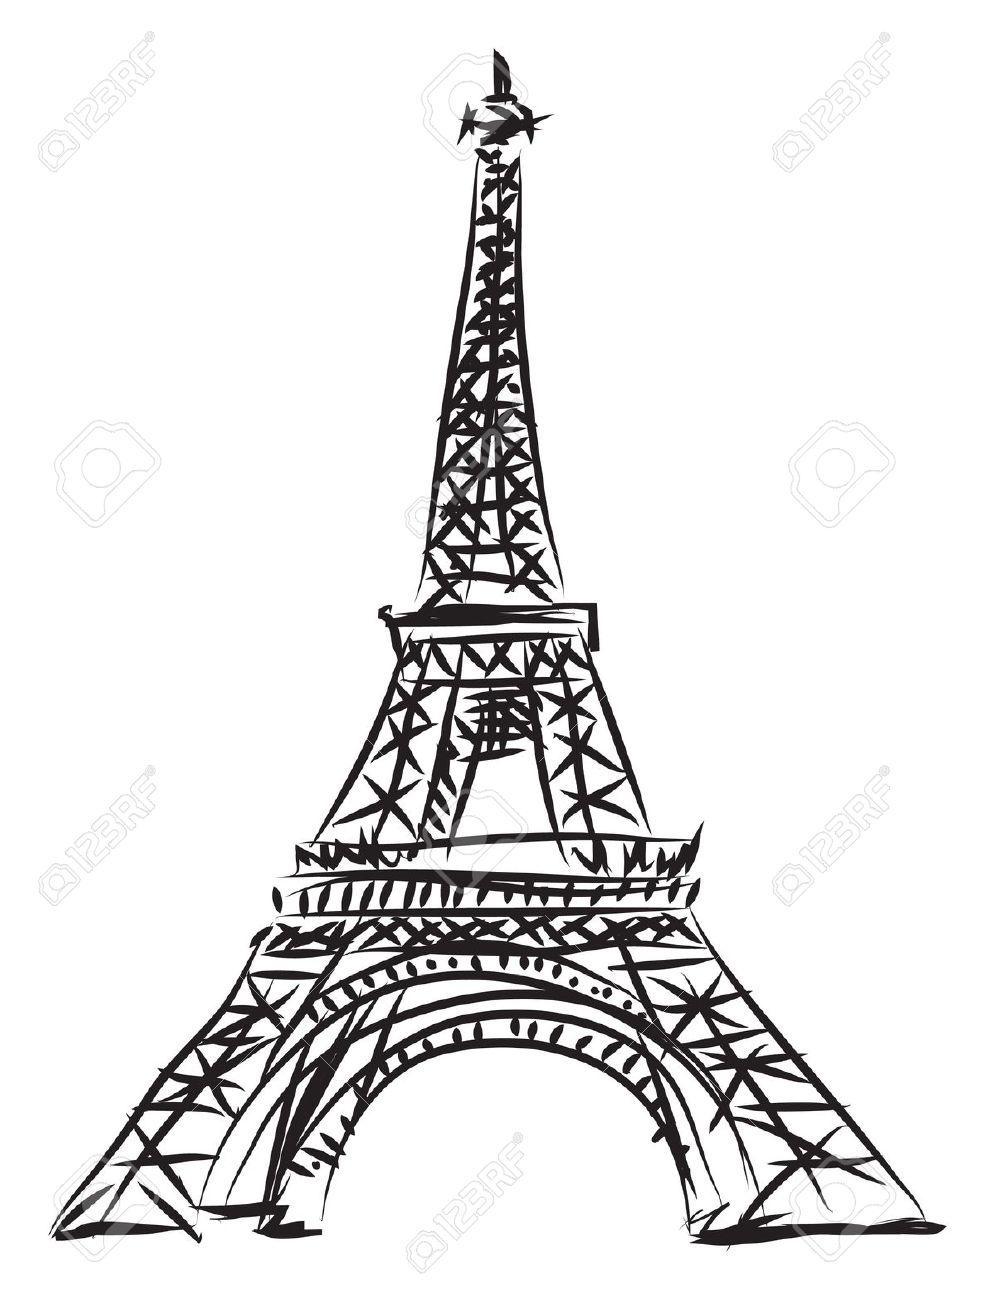 995x1300 Eiffel Tower Clipart Drawn